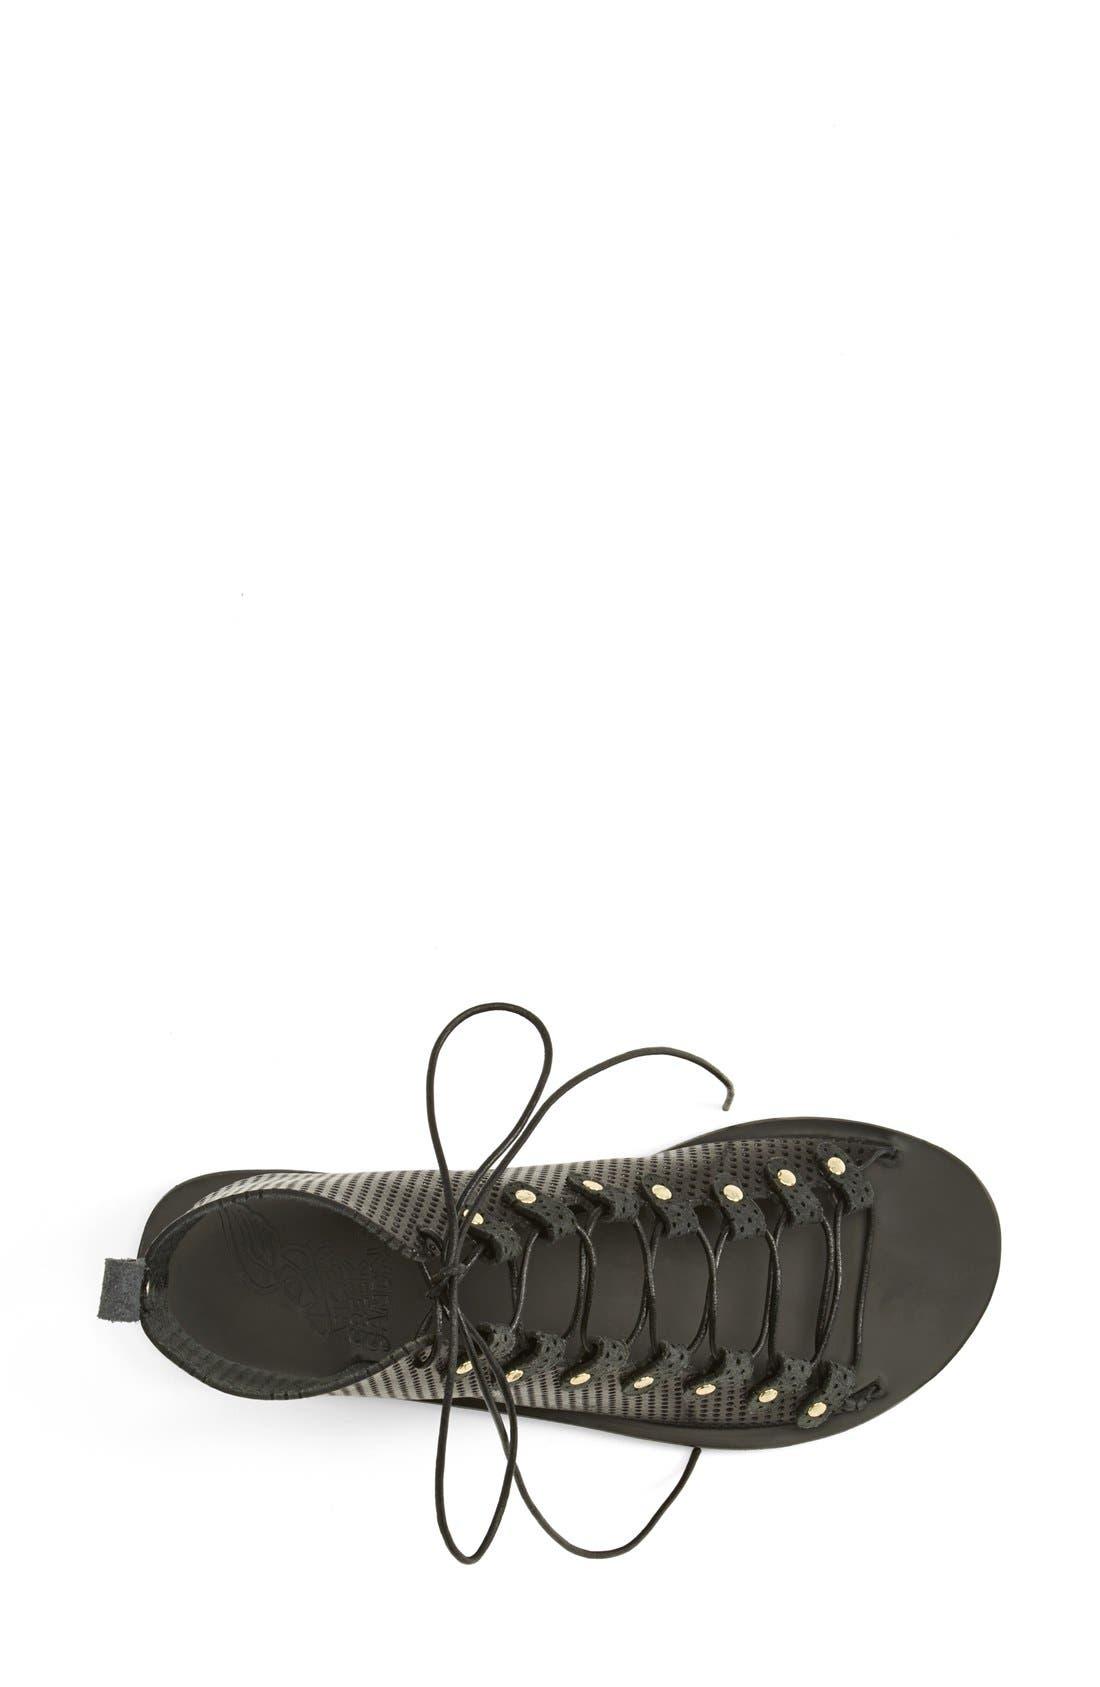 Alternate Image 3  - Ancient Greek Sandals 'Mache' Perforated Sandal (Women)